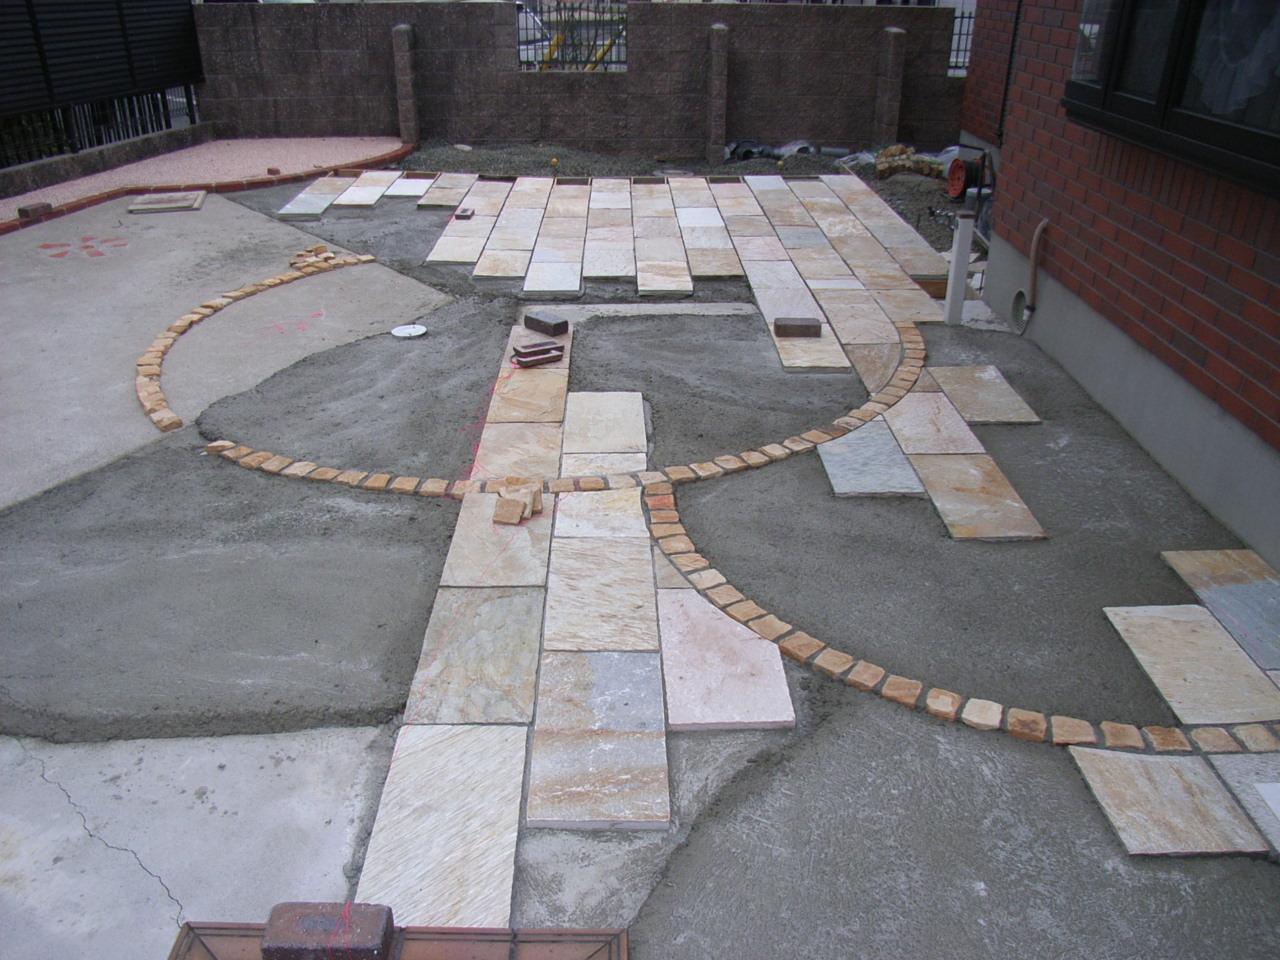 20091119 001